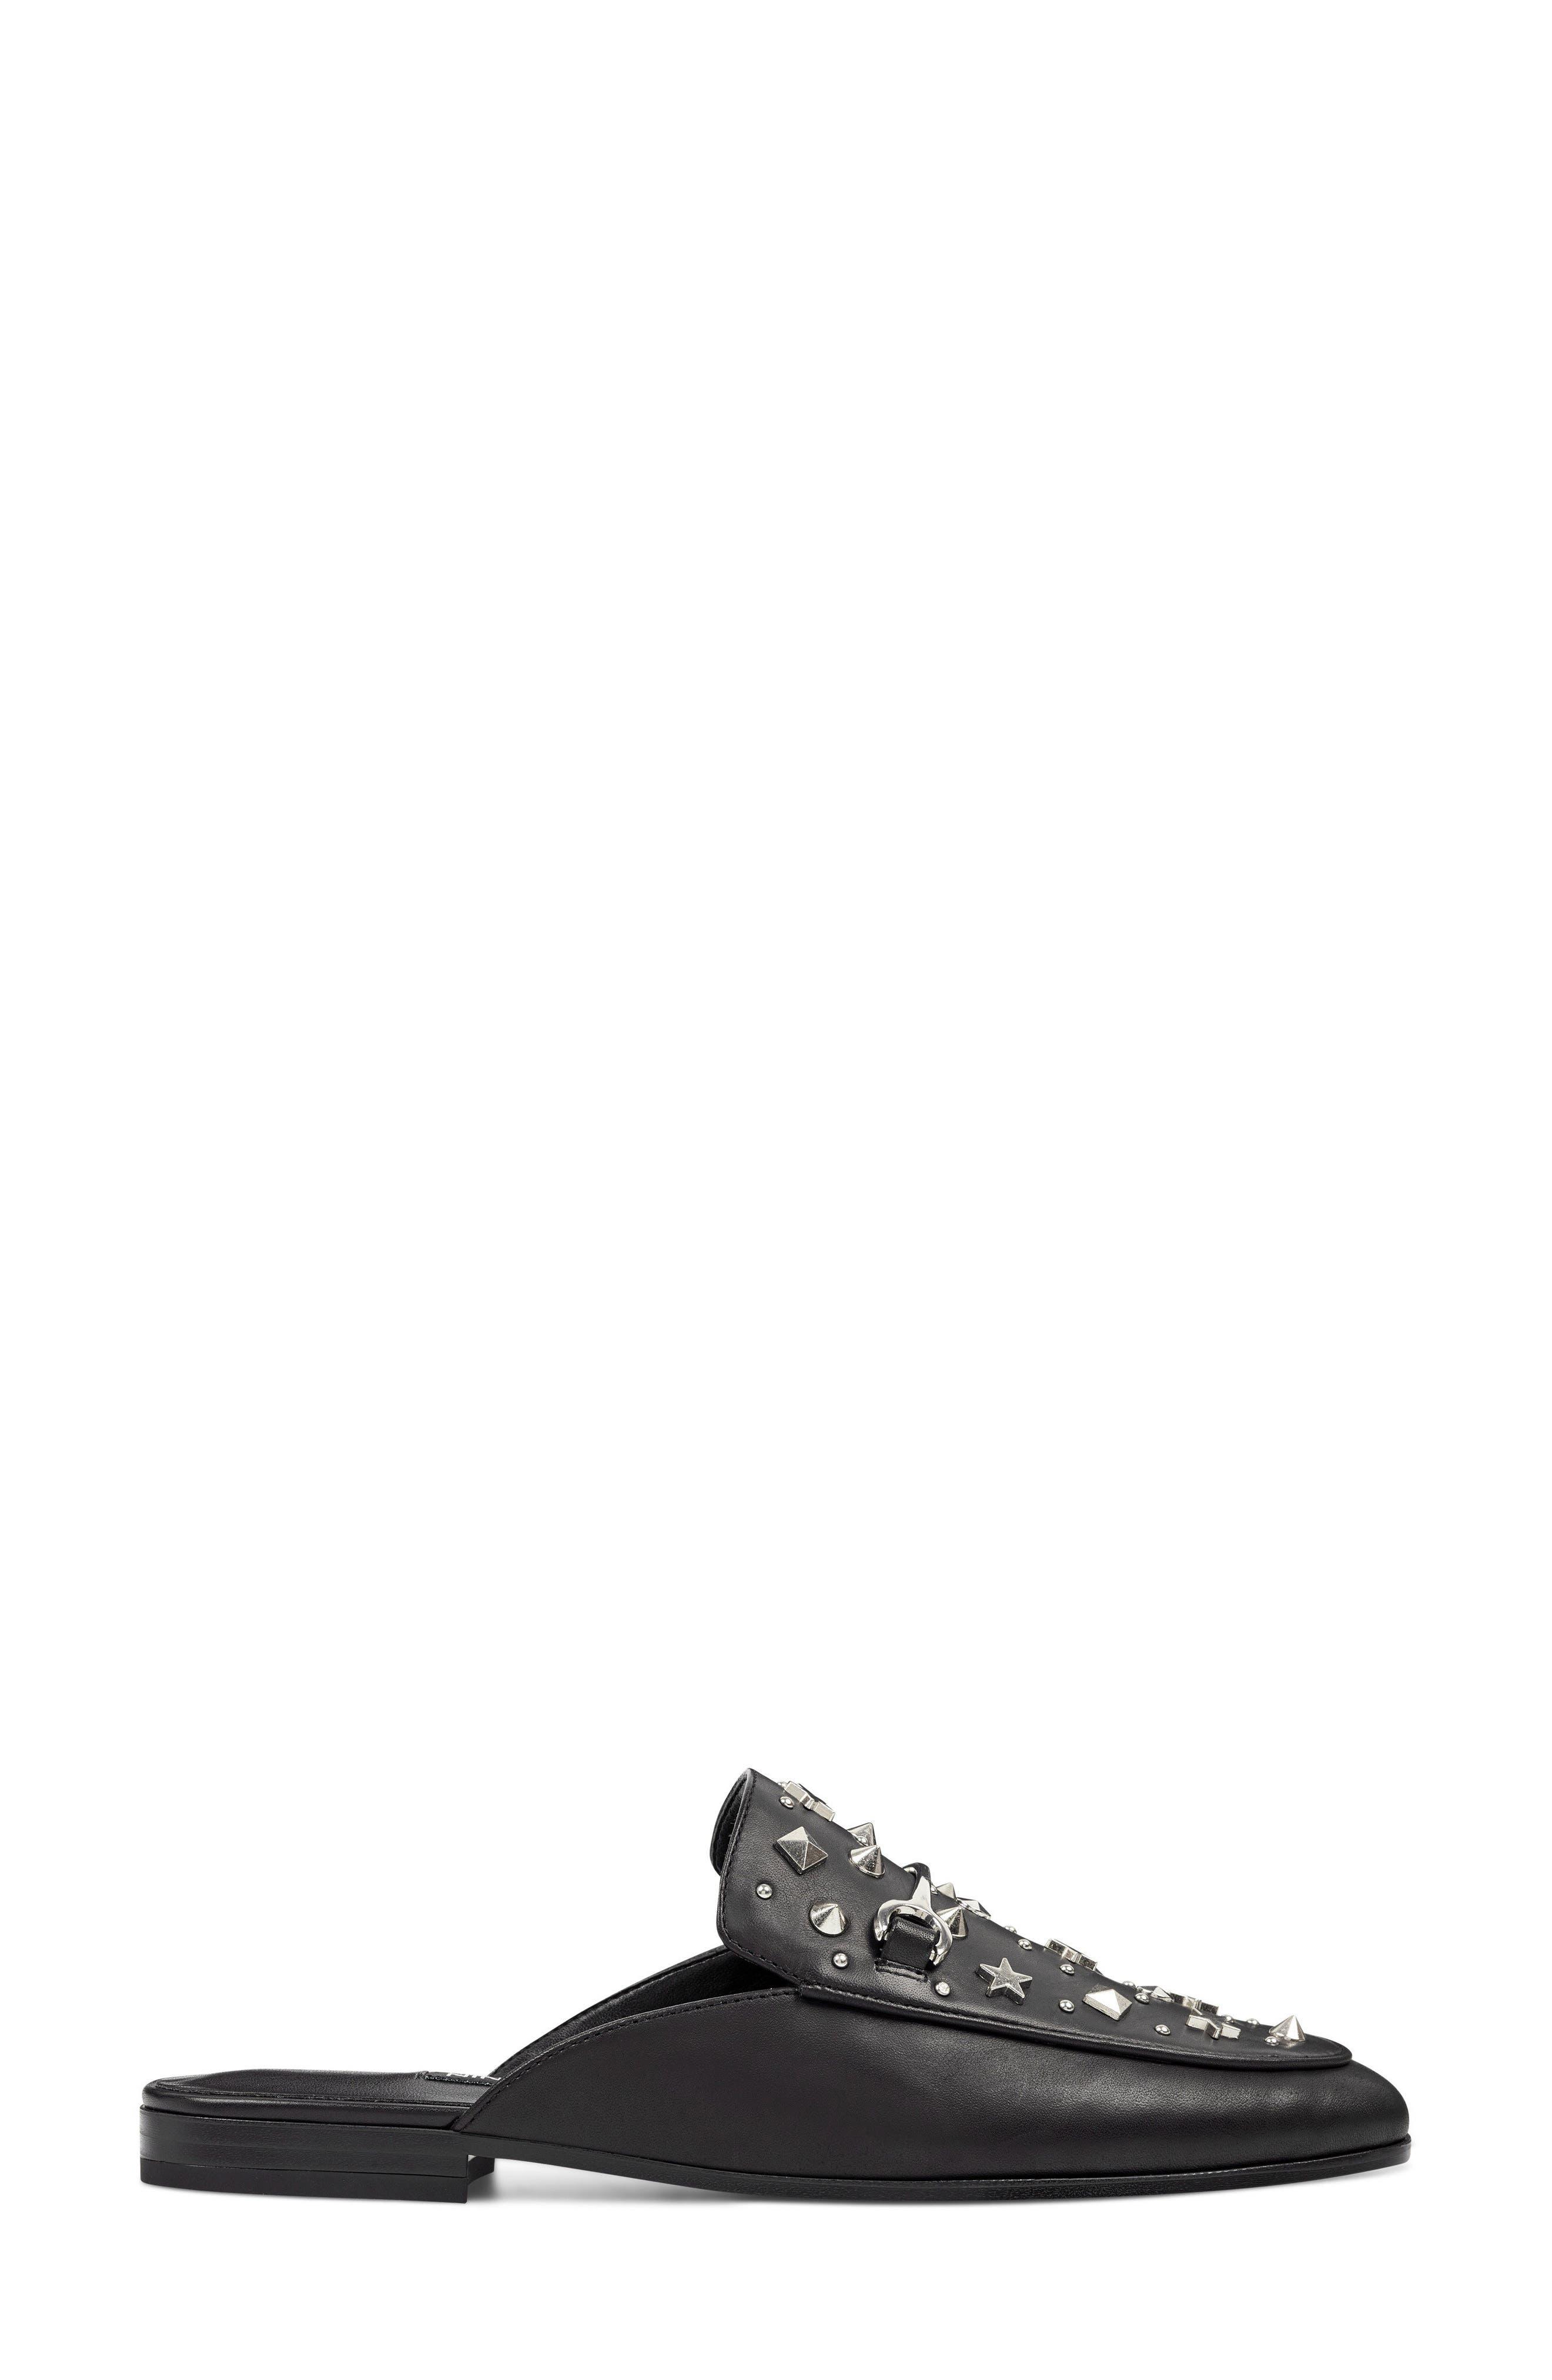 Welynne Mule,                             Alternate thumbnail 3, color,                             Black Leather